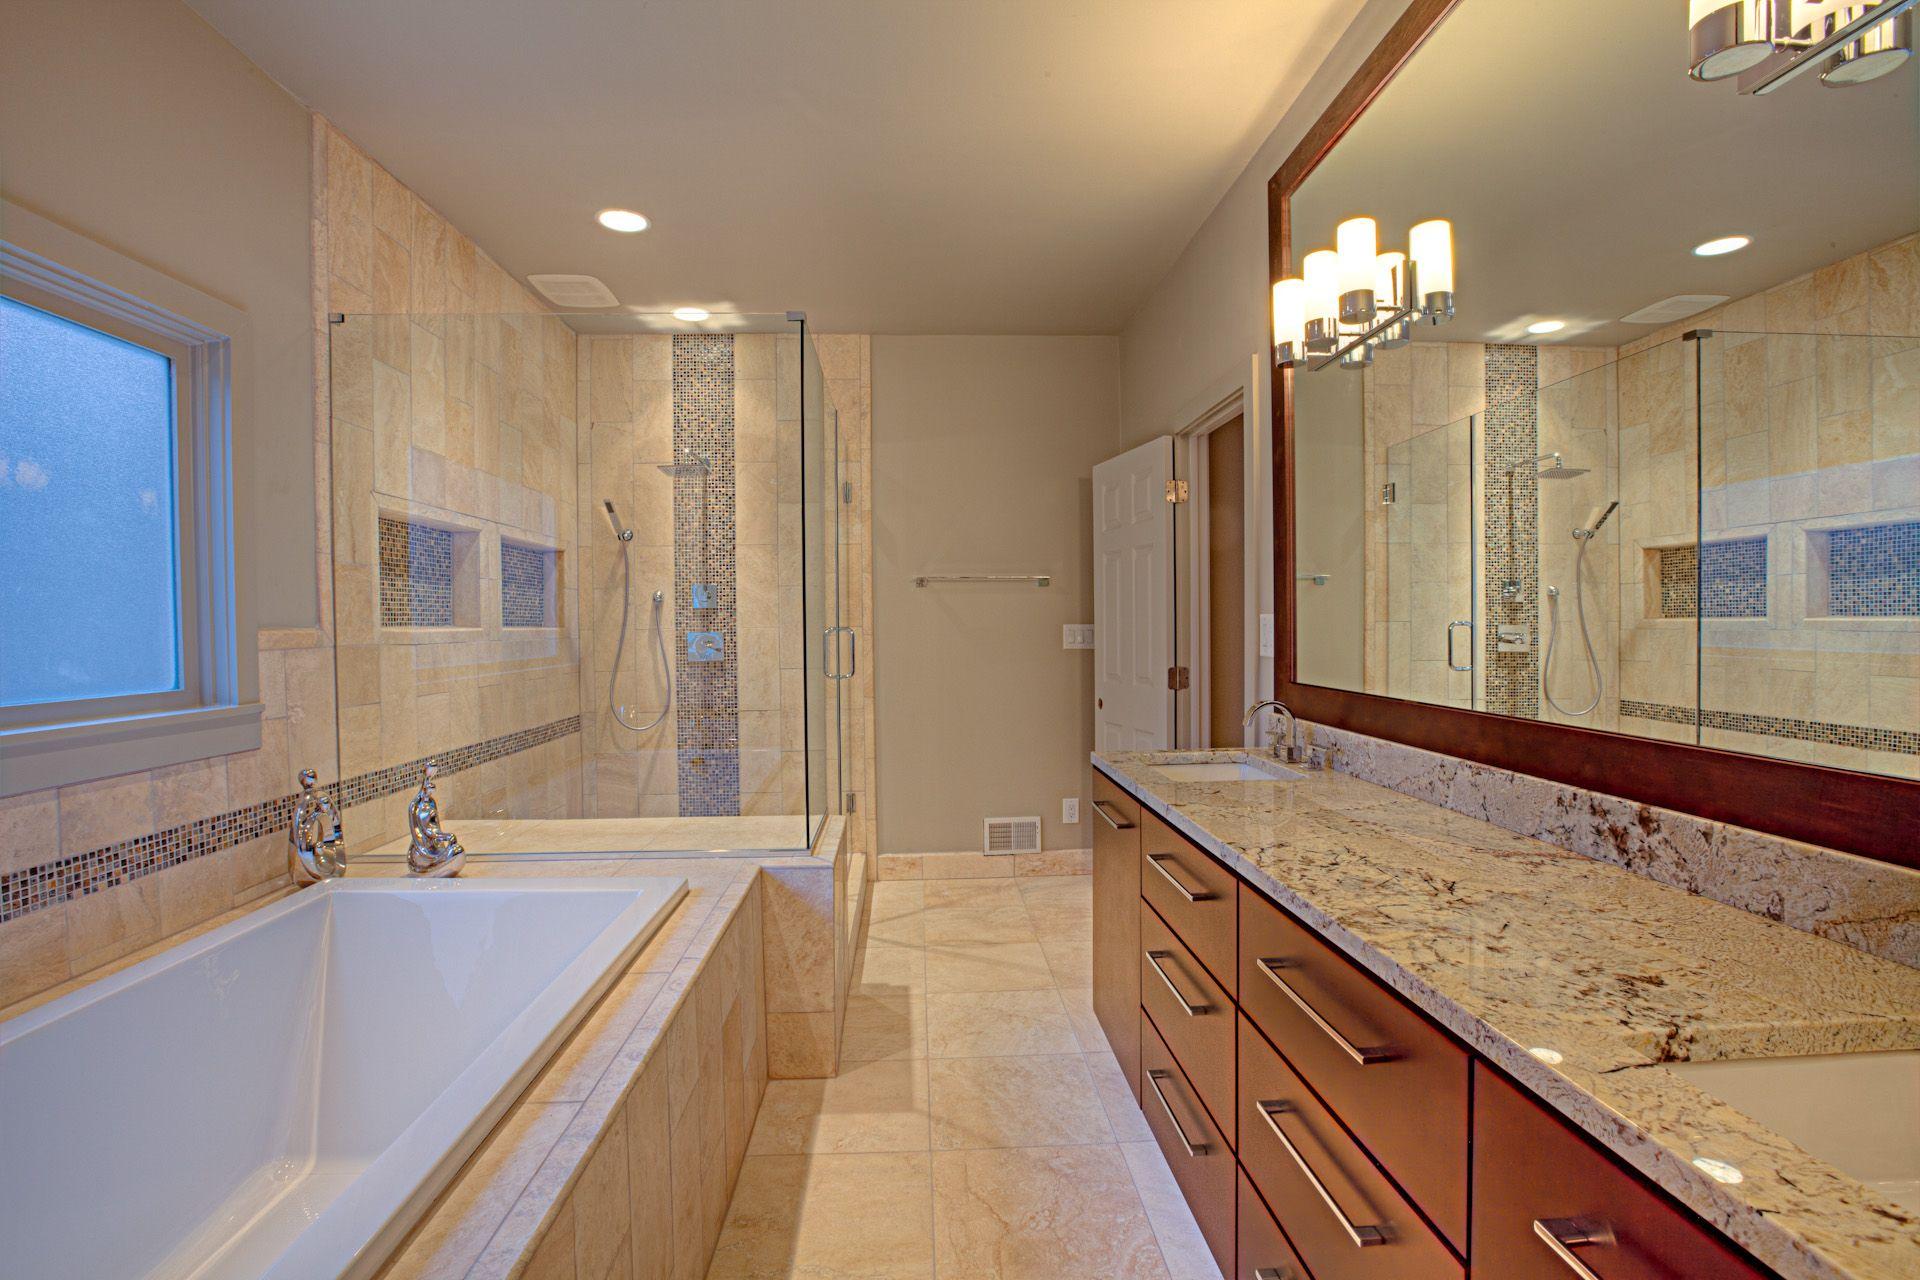 1000 Images About Bathroom Remodel On Vanities Light Lovely Master Bathroom Renovation Ideas Master Bathroom